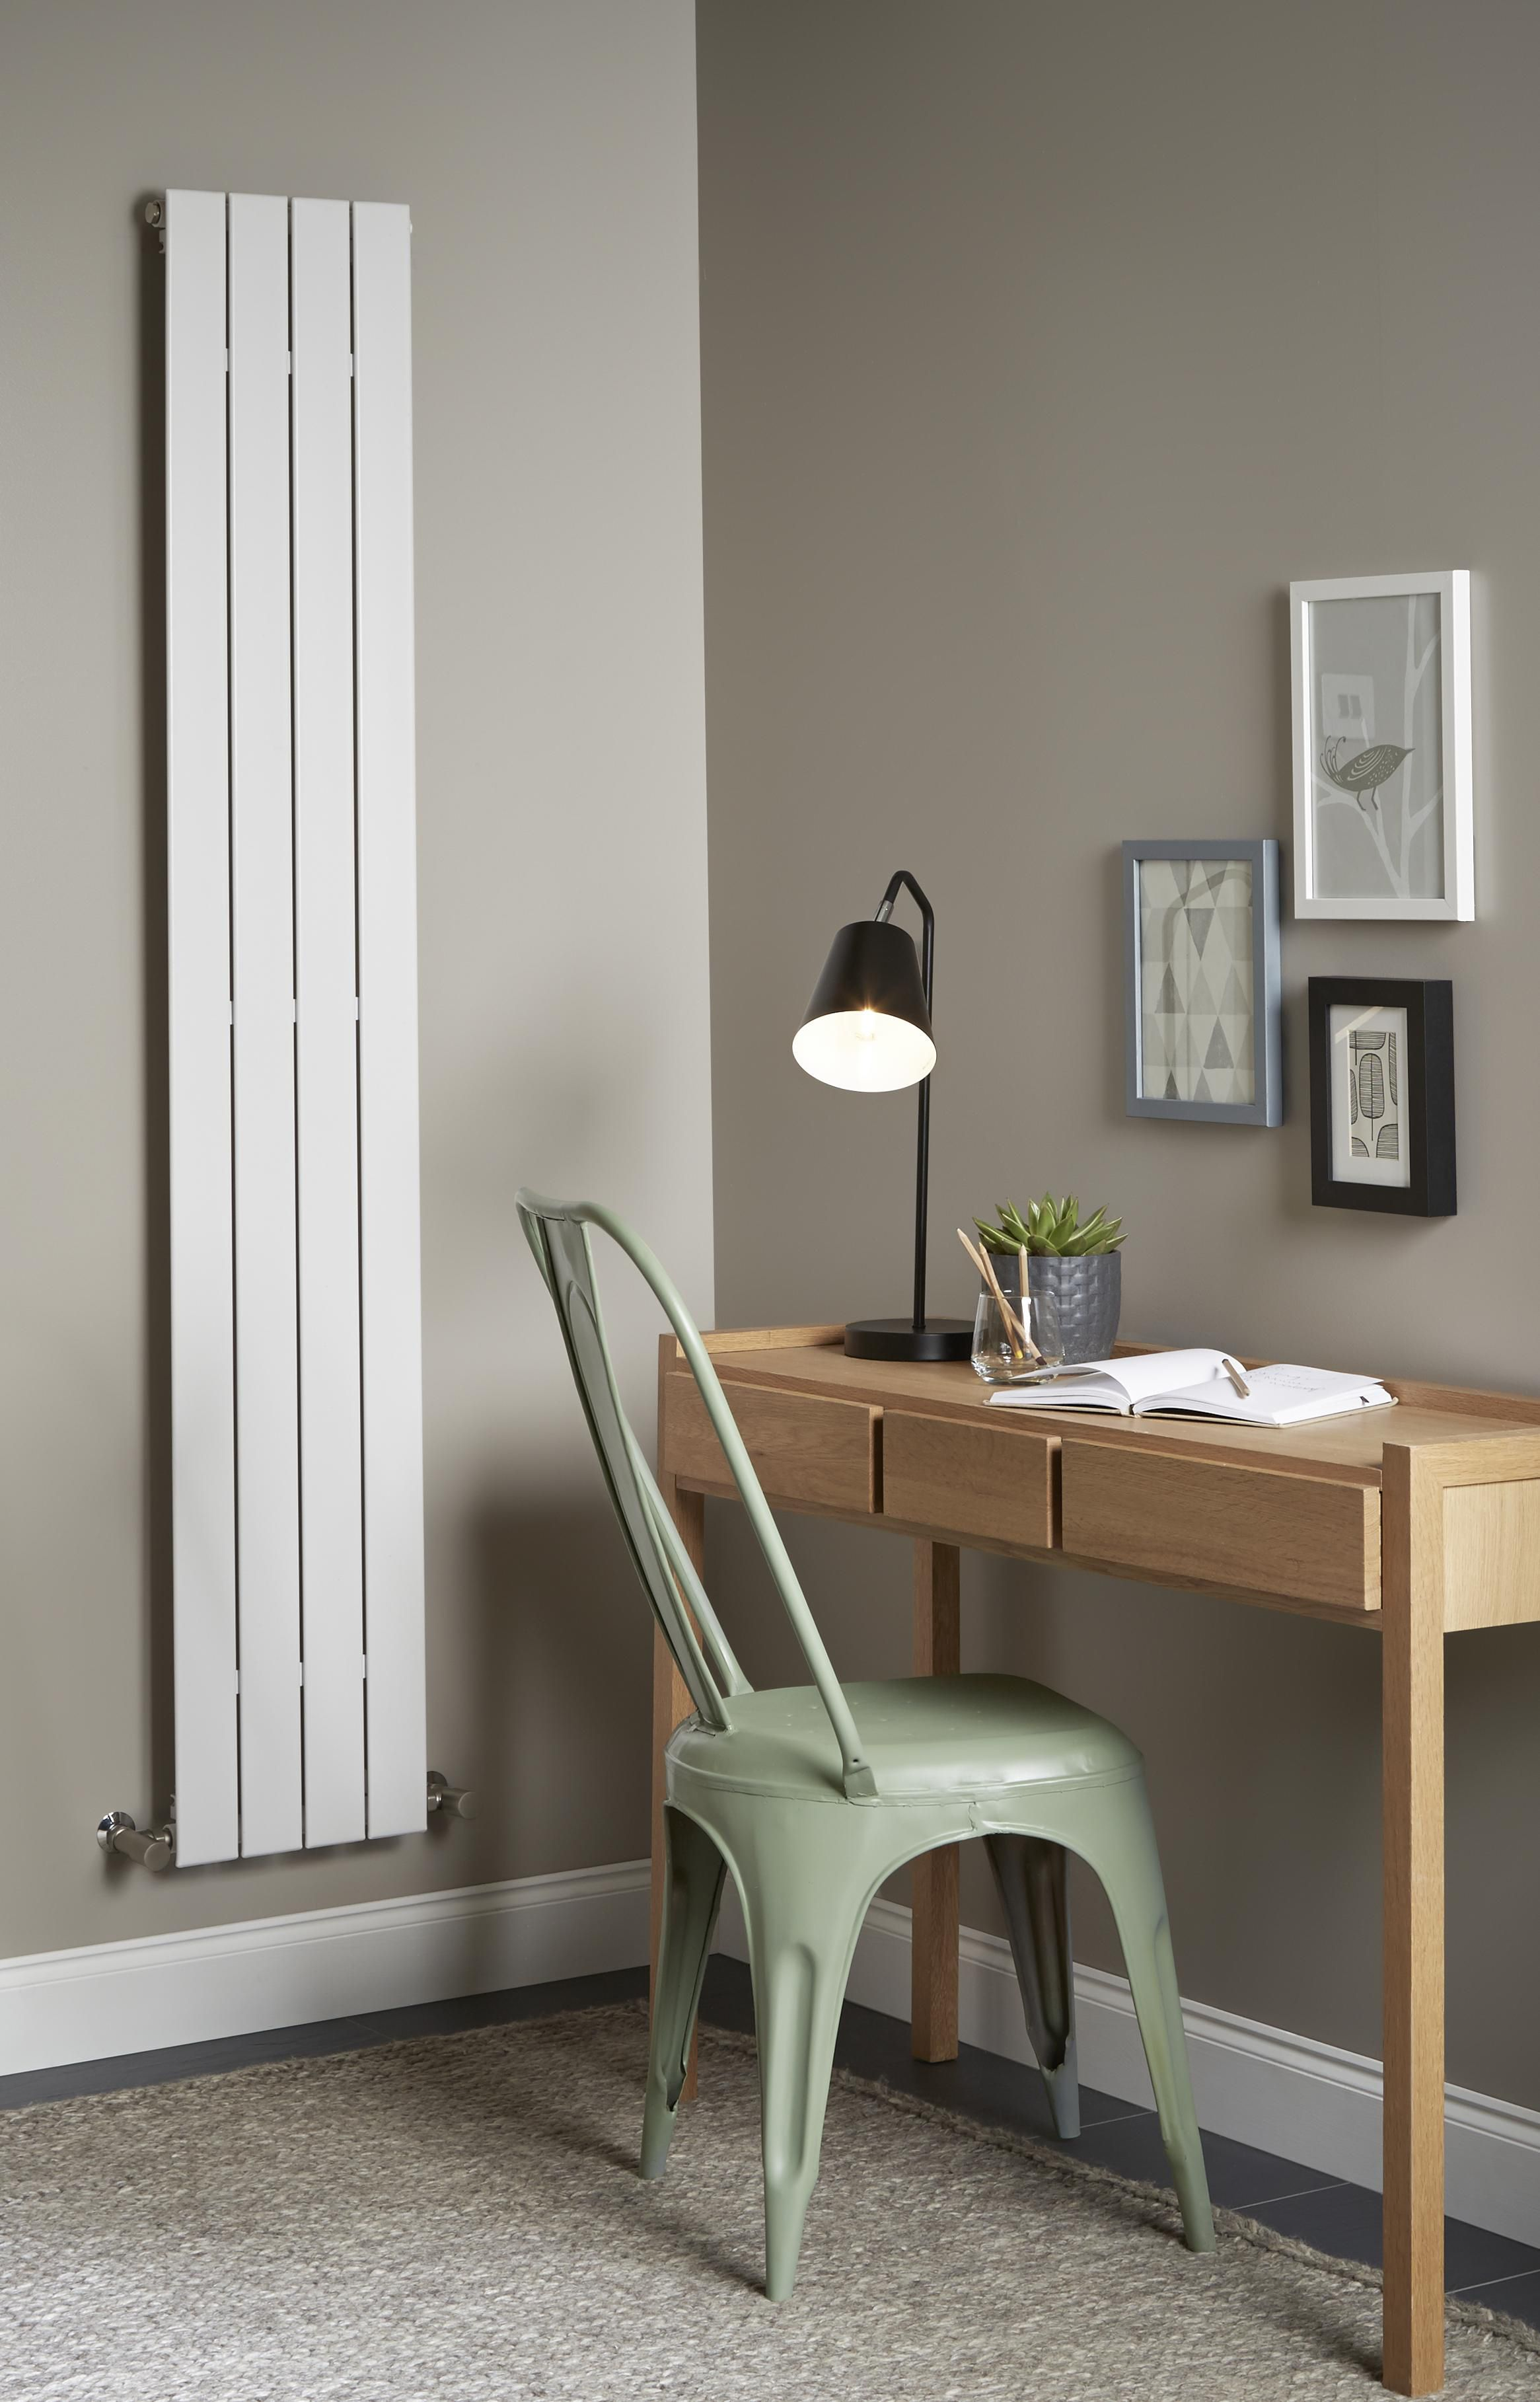 Designer Living Room Radiators: Get Creative With A Vertical Designer White Radiator